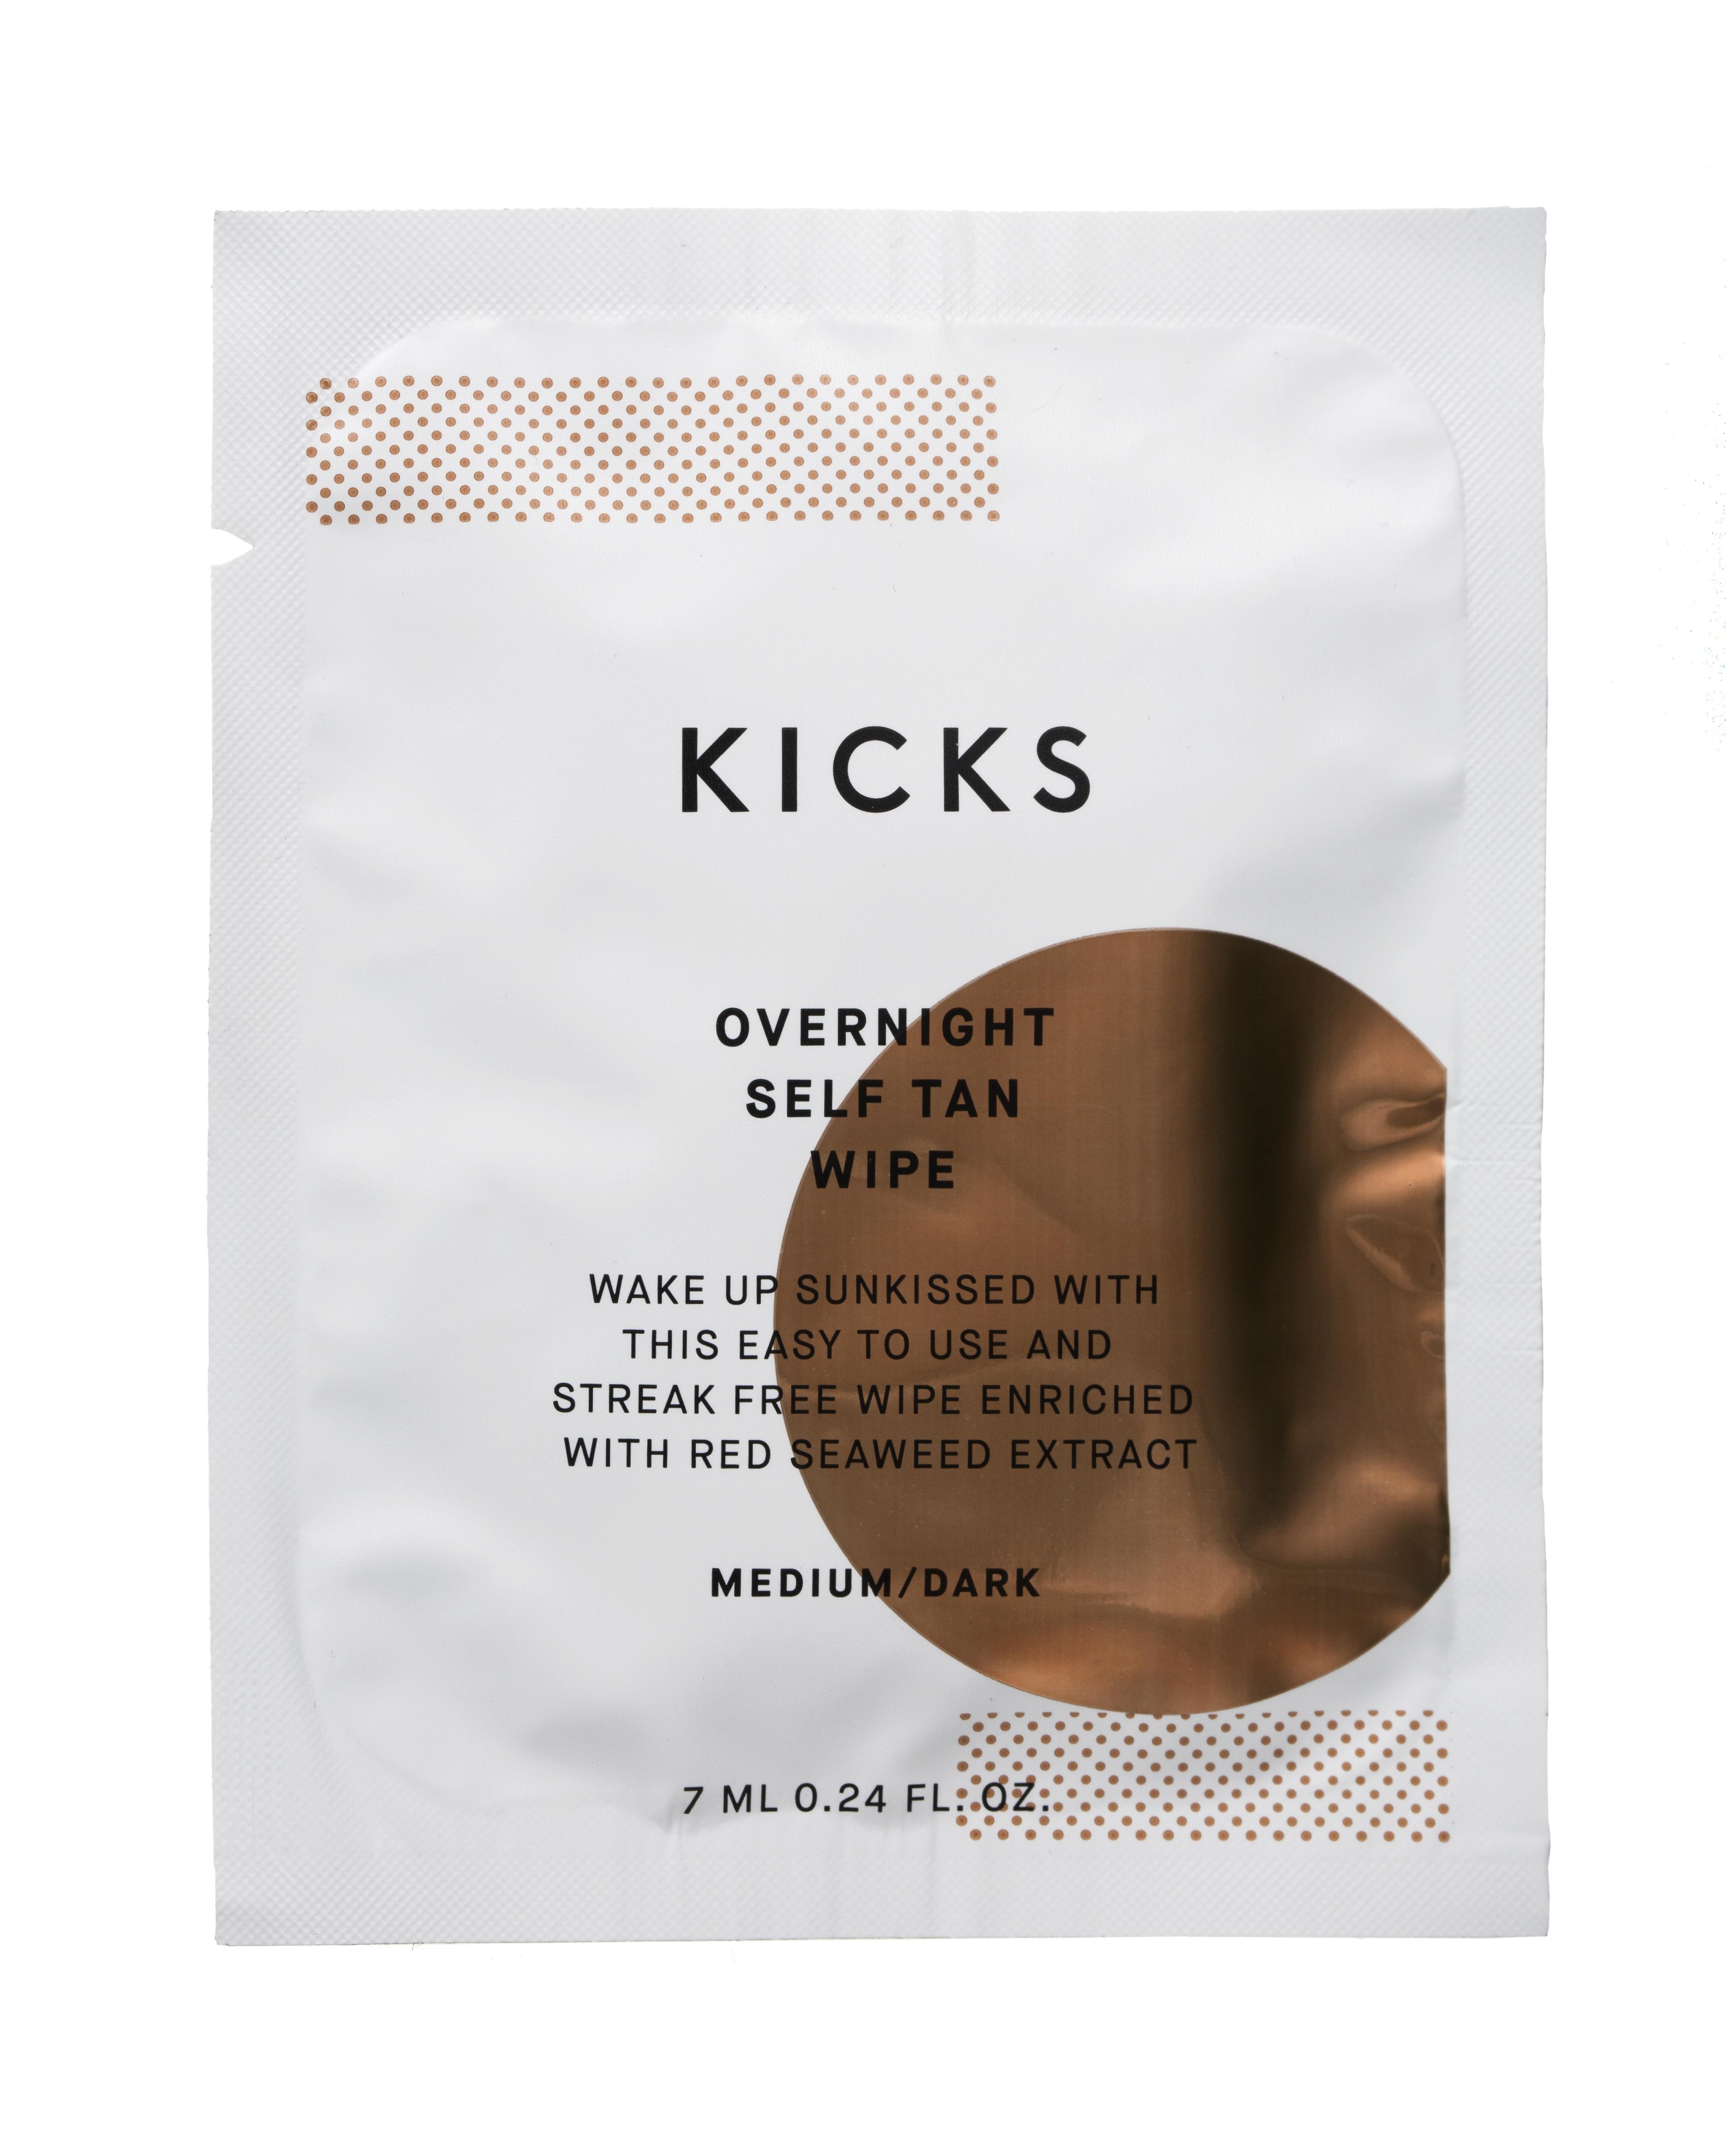 Overnight Self Tan Wipe Medium/Dark